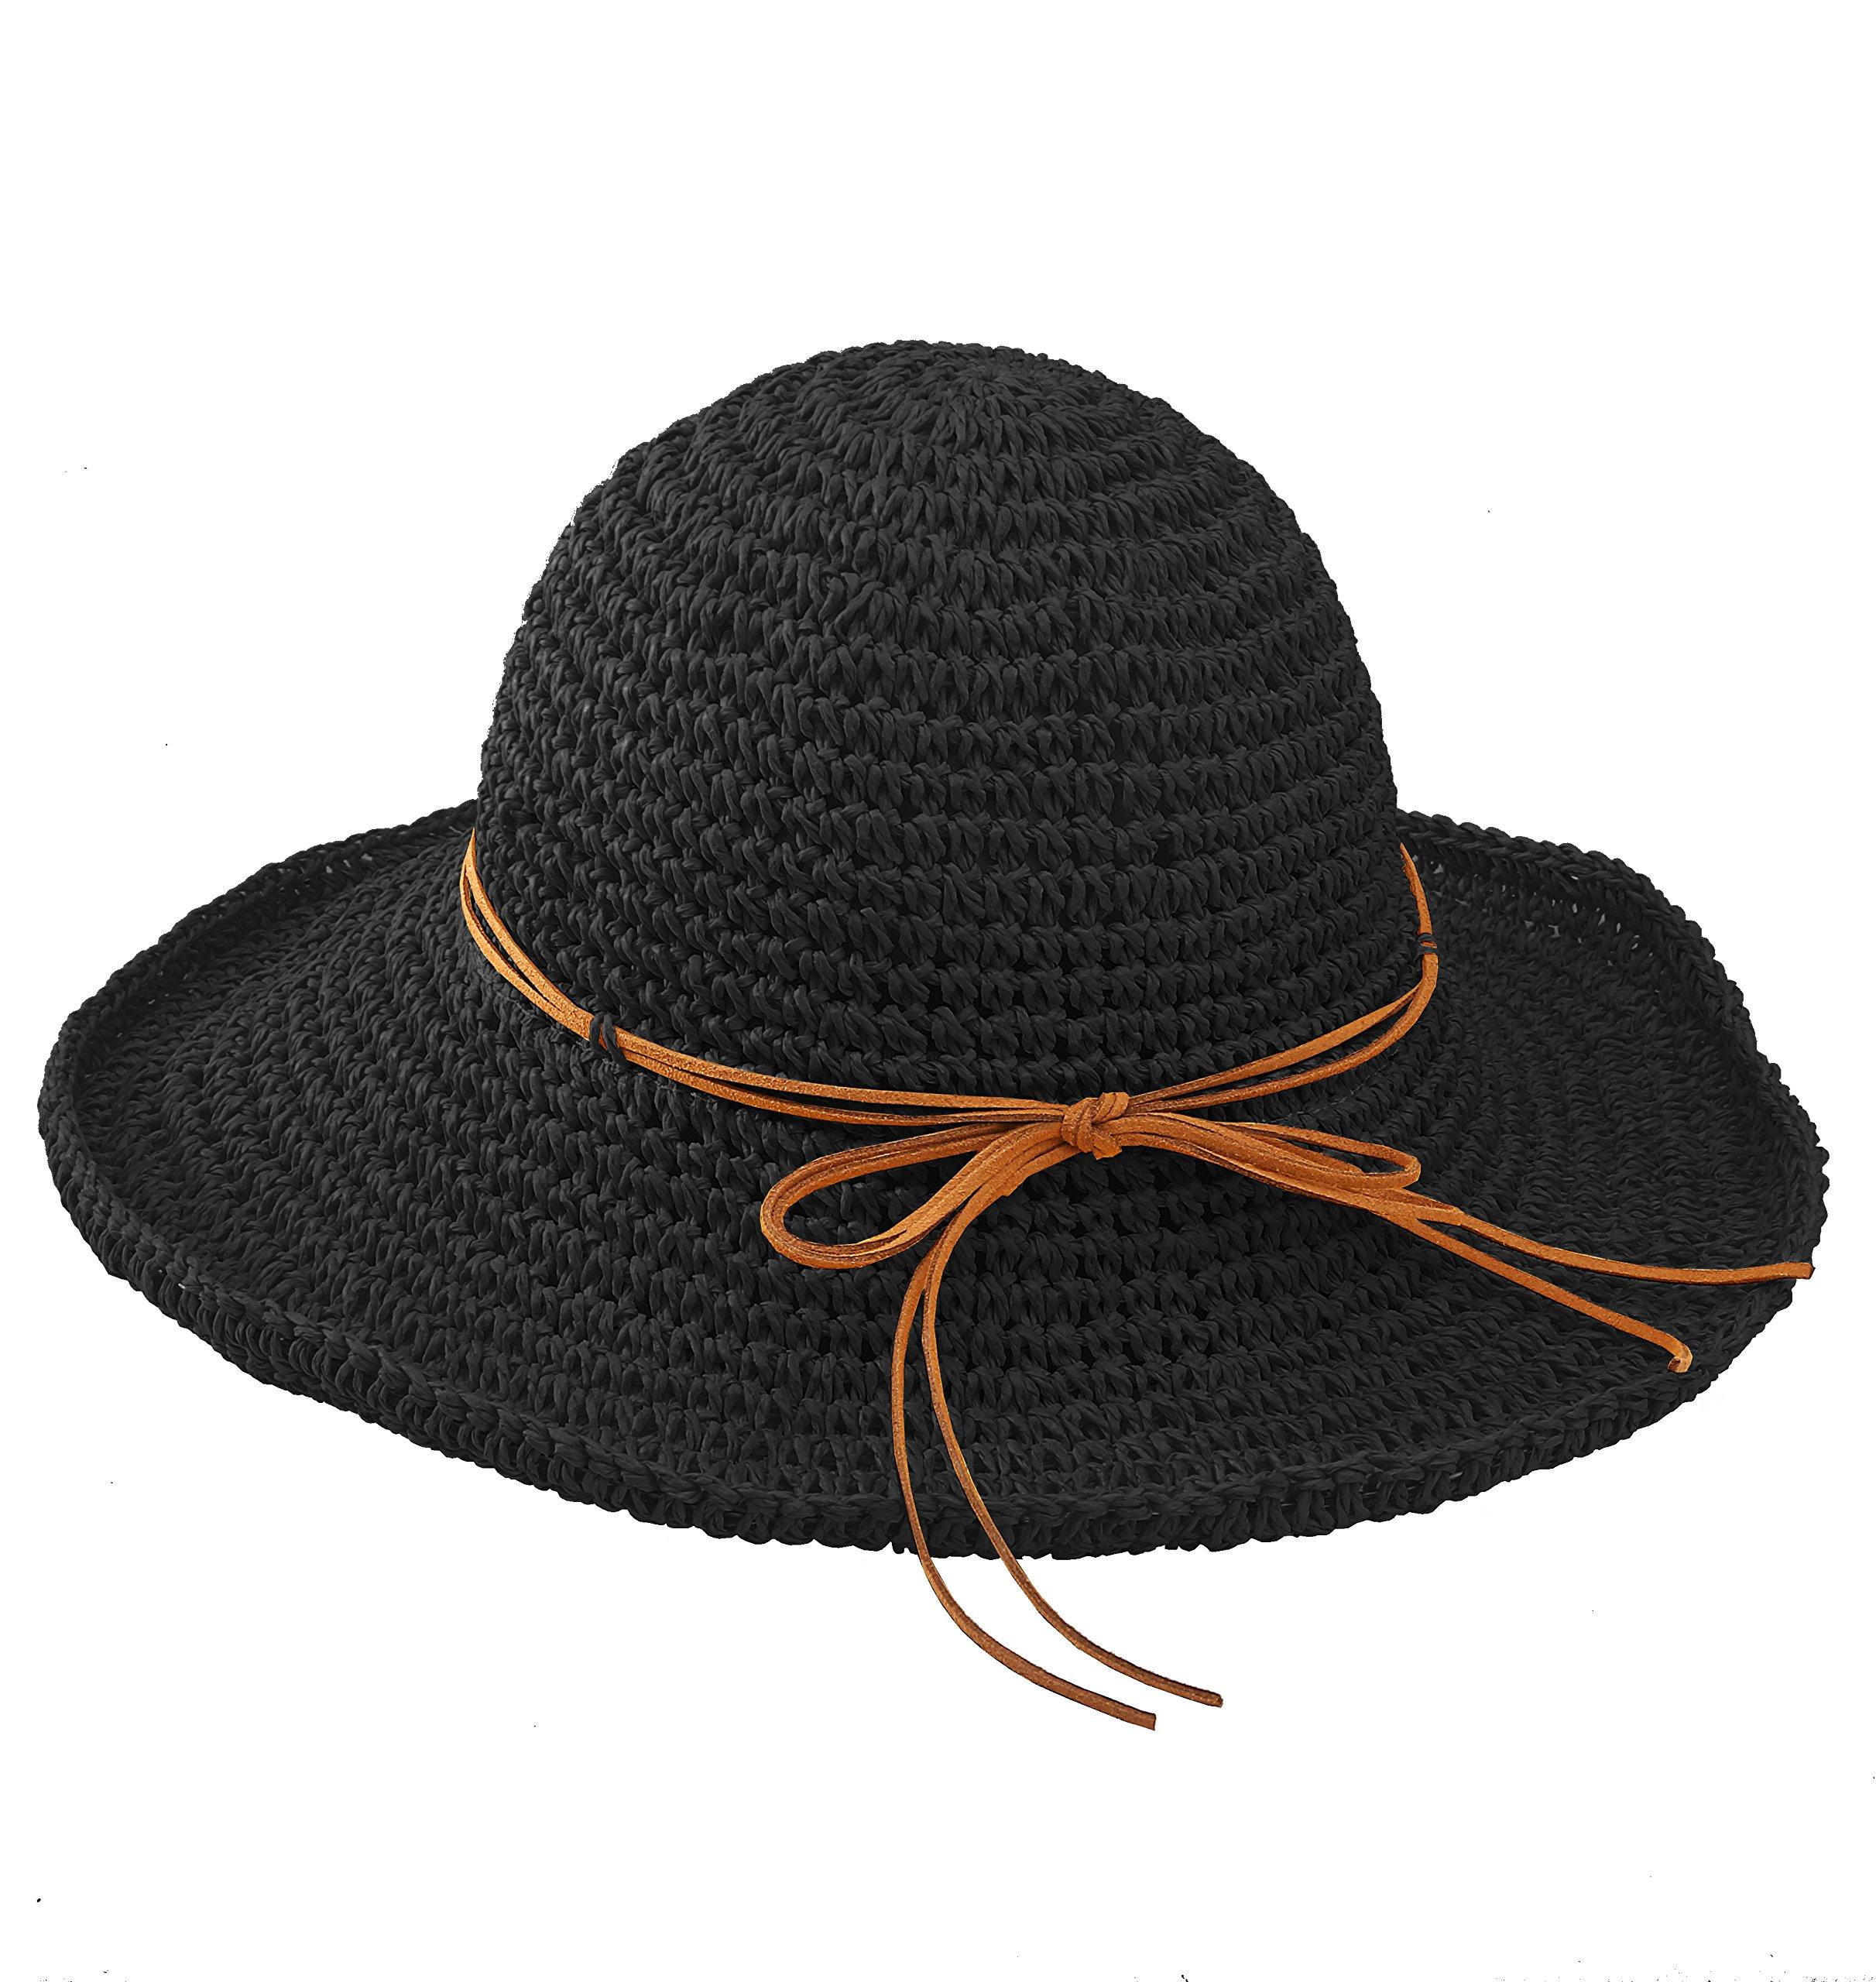 EXCHIC Women Sun Beach Straw Hat Wide Brim Foldable Summer Travel Cap (Black)